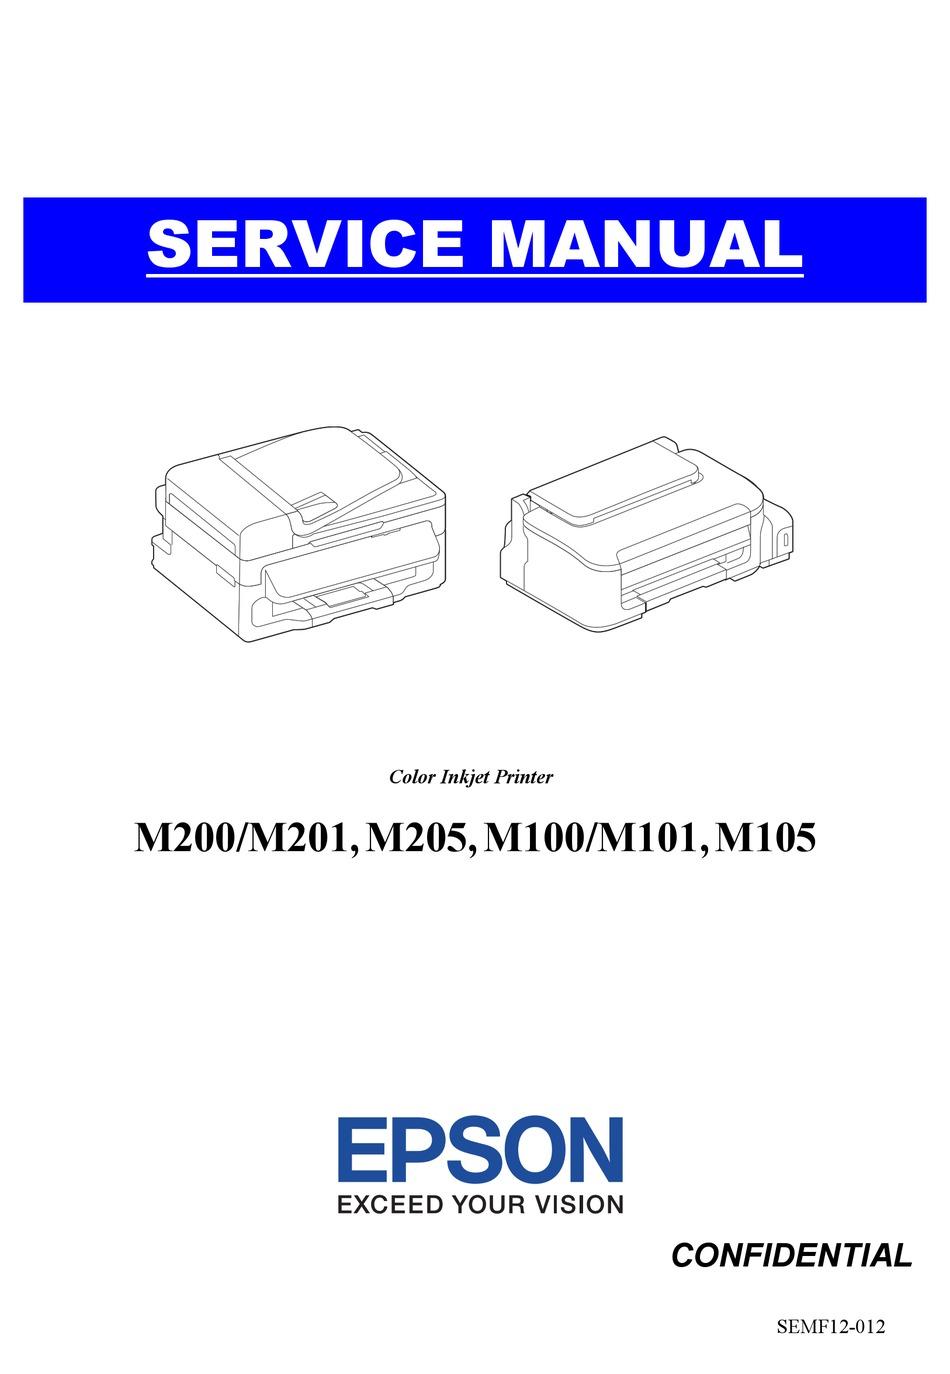 Driver Printer Epson M200 : driver, printer, epson, EPSON, SERIES, SERVICE, MANUAL, Download, ManualsLib